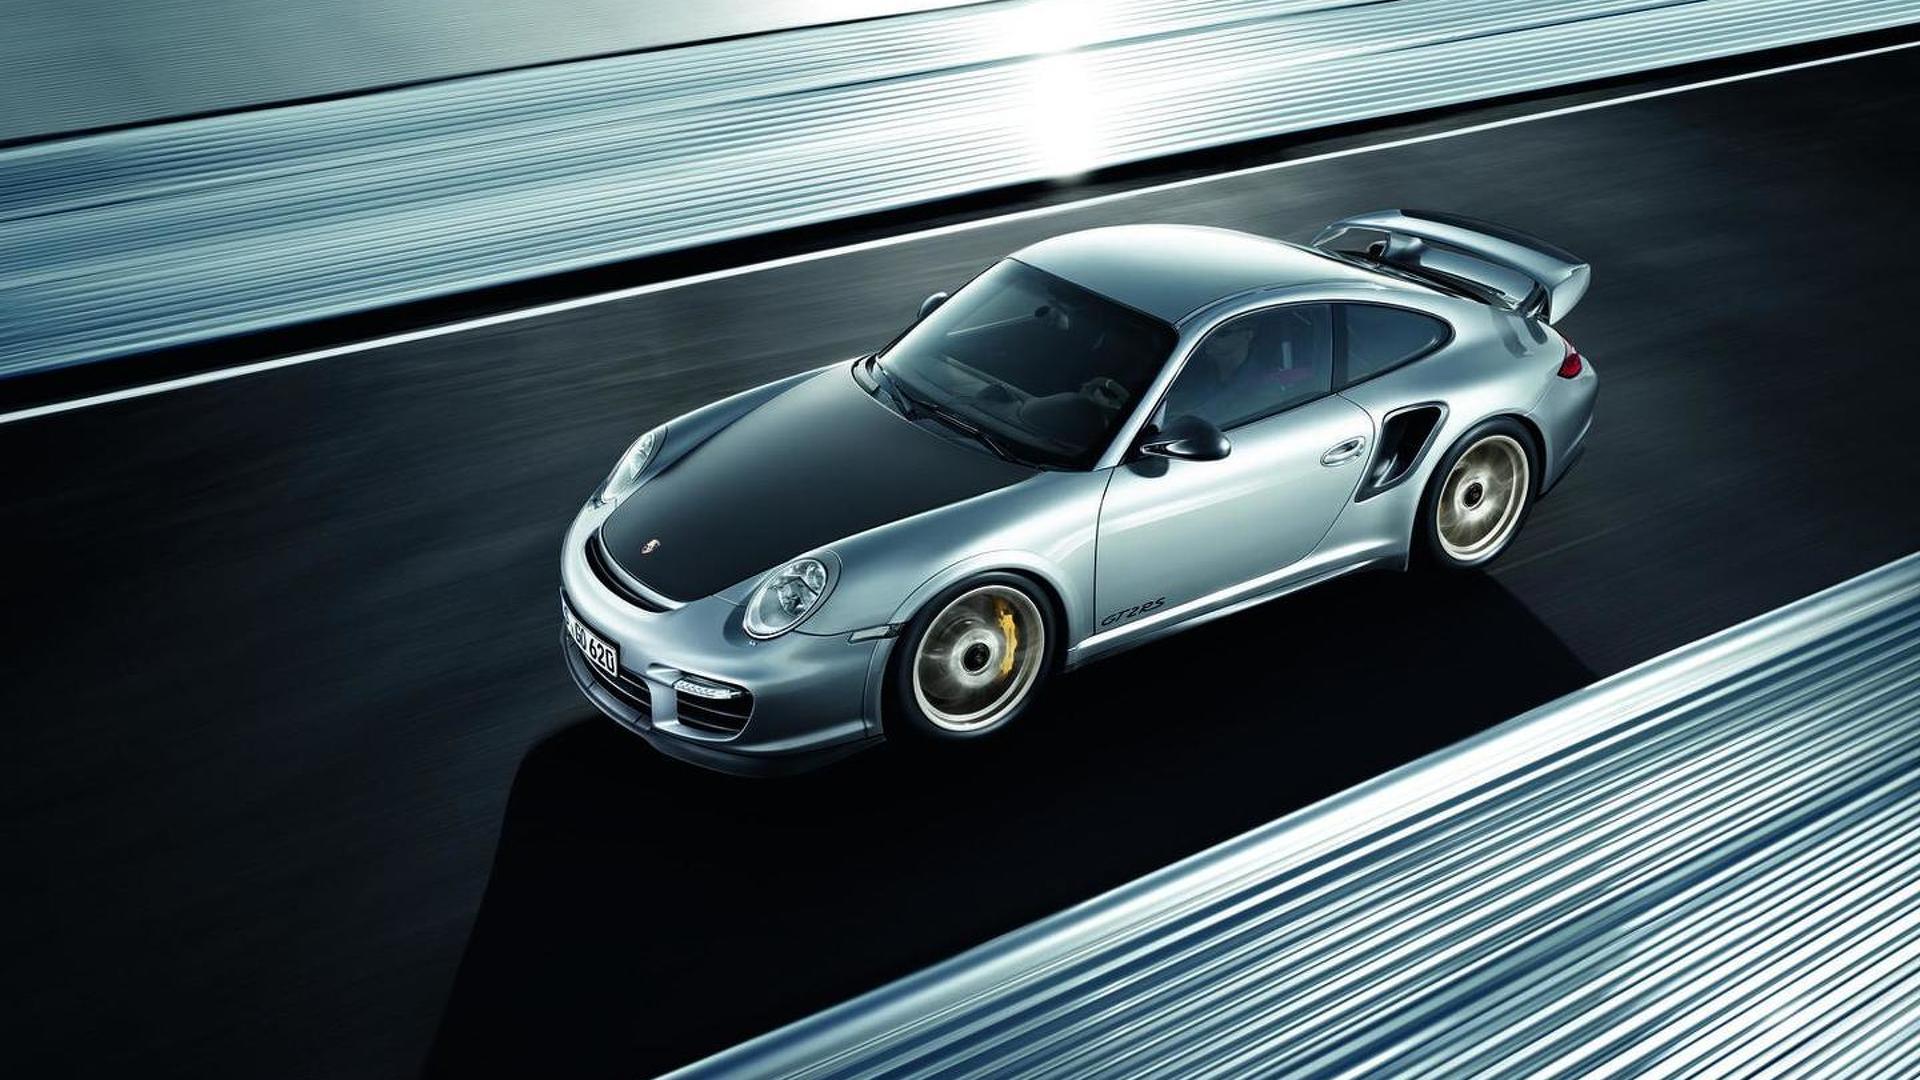 2010-253308-2011-porsche-911-gt2-rs-first-official-photos-12-05-20101 Astounding Porsche 911 Gt2 for Sale Canada Cars Trend